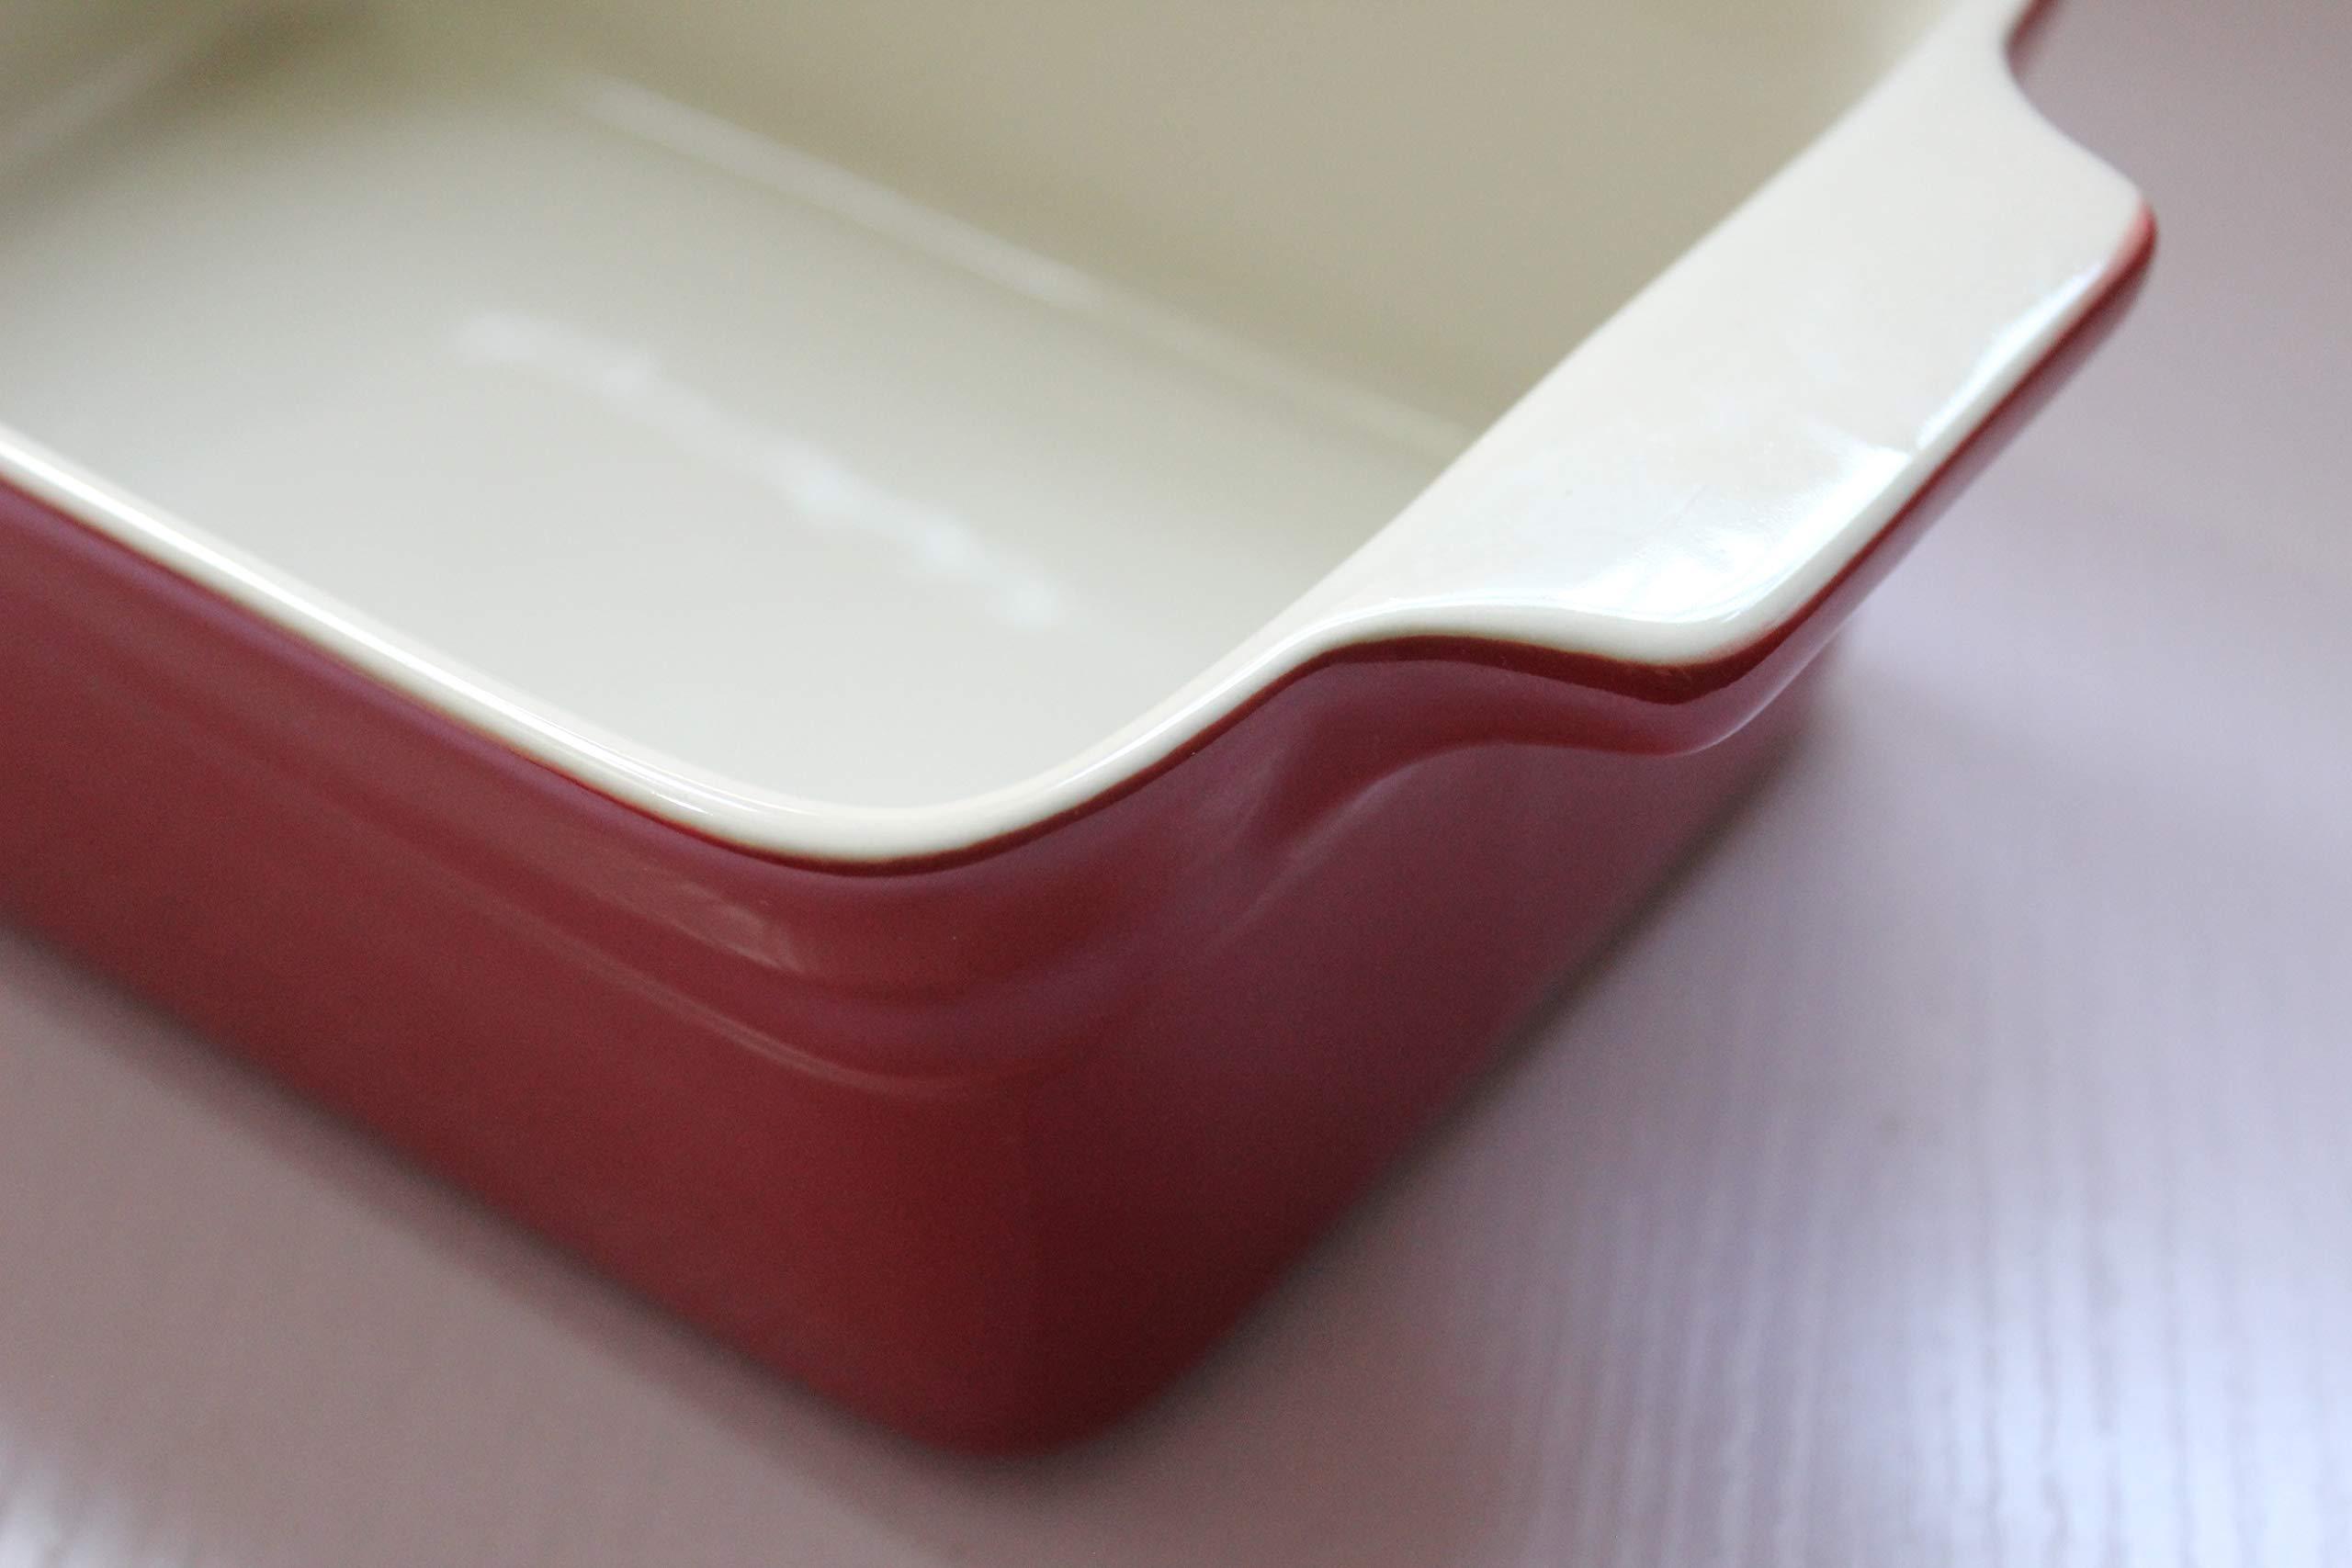 Lonovel Rectangular Baking Dish Roasting Lasagna Pan,11.5-Inch Classic Stoneware Ceramic Large Rectangular Bakers,Red by Lonovel (Image #8)